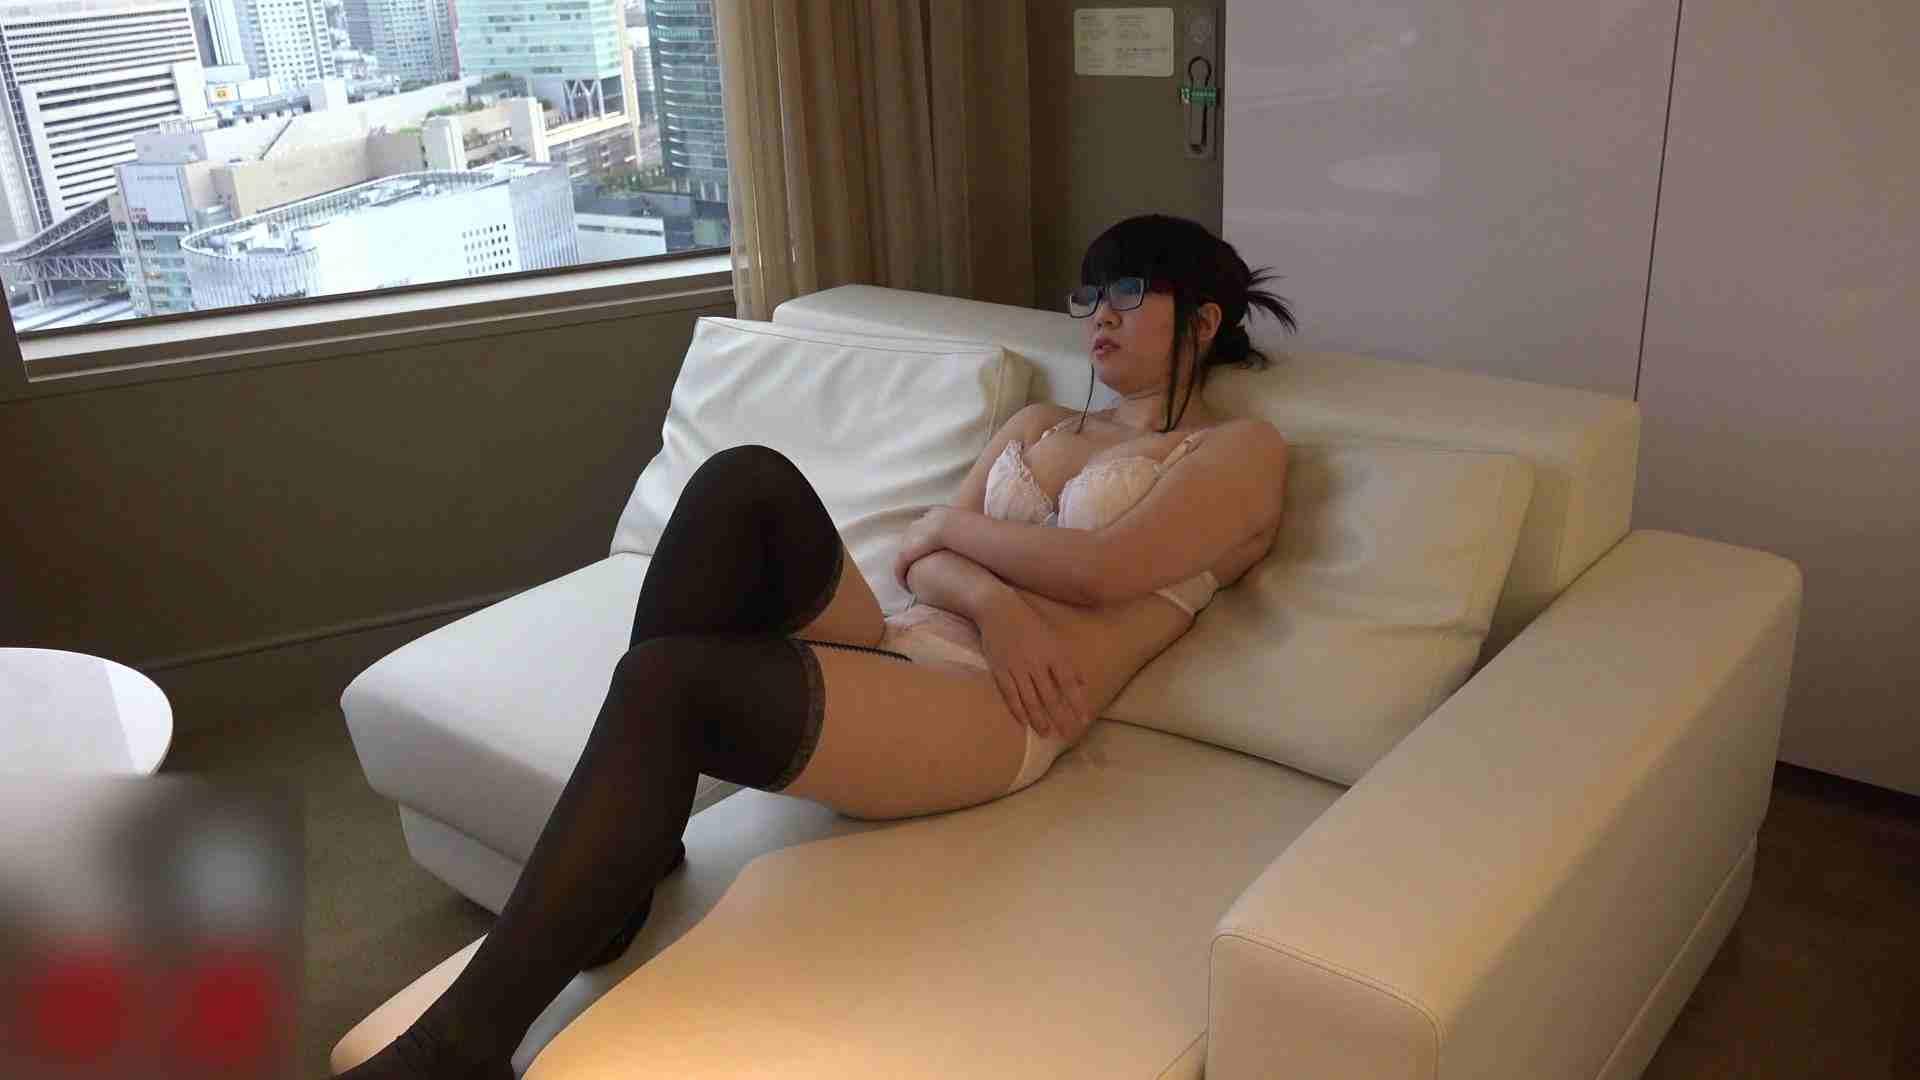 S級厳選美女ビッチガールVol.39 前編 0 | 0  112画像 71